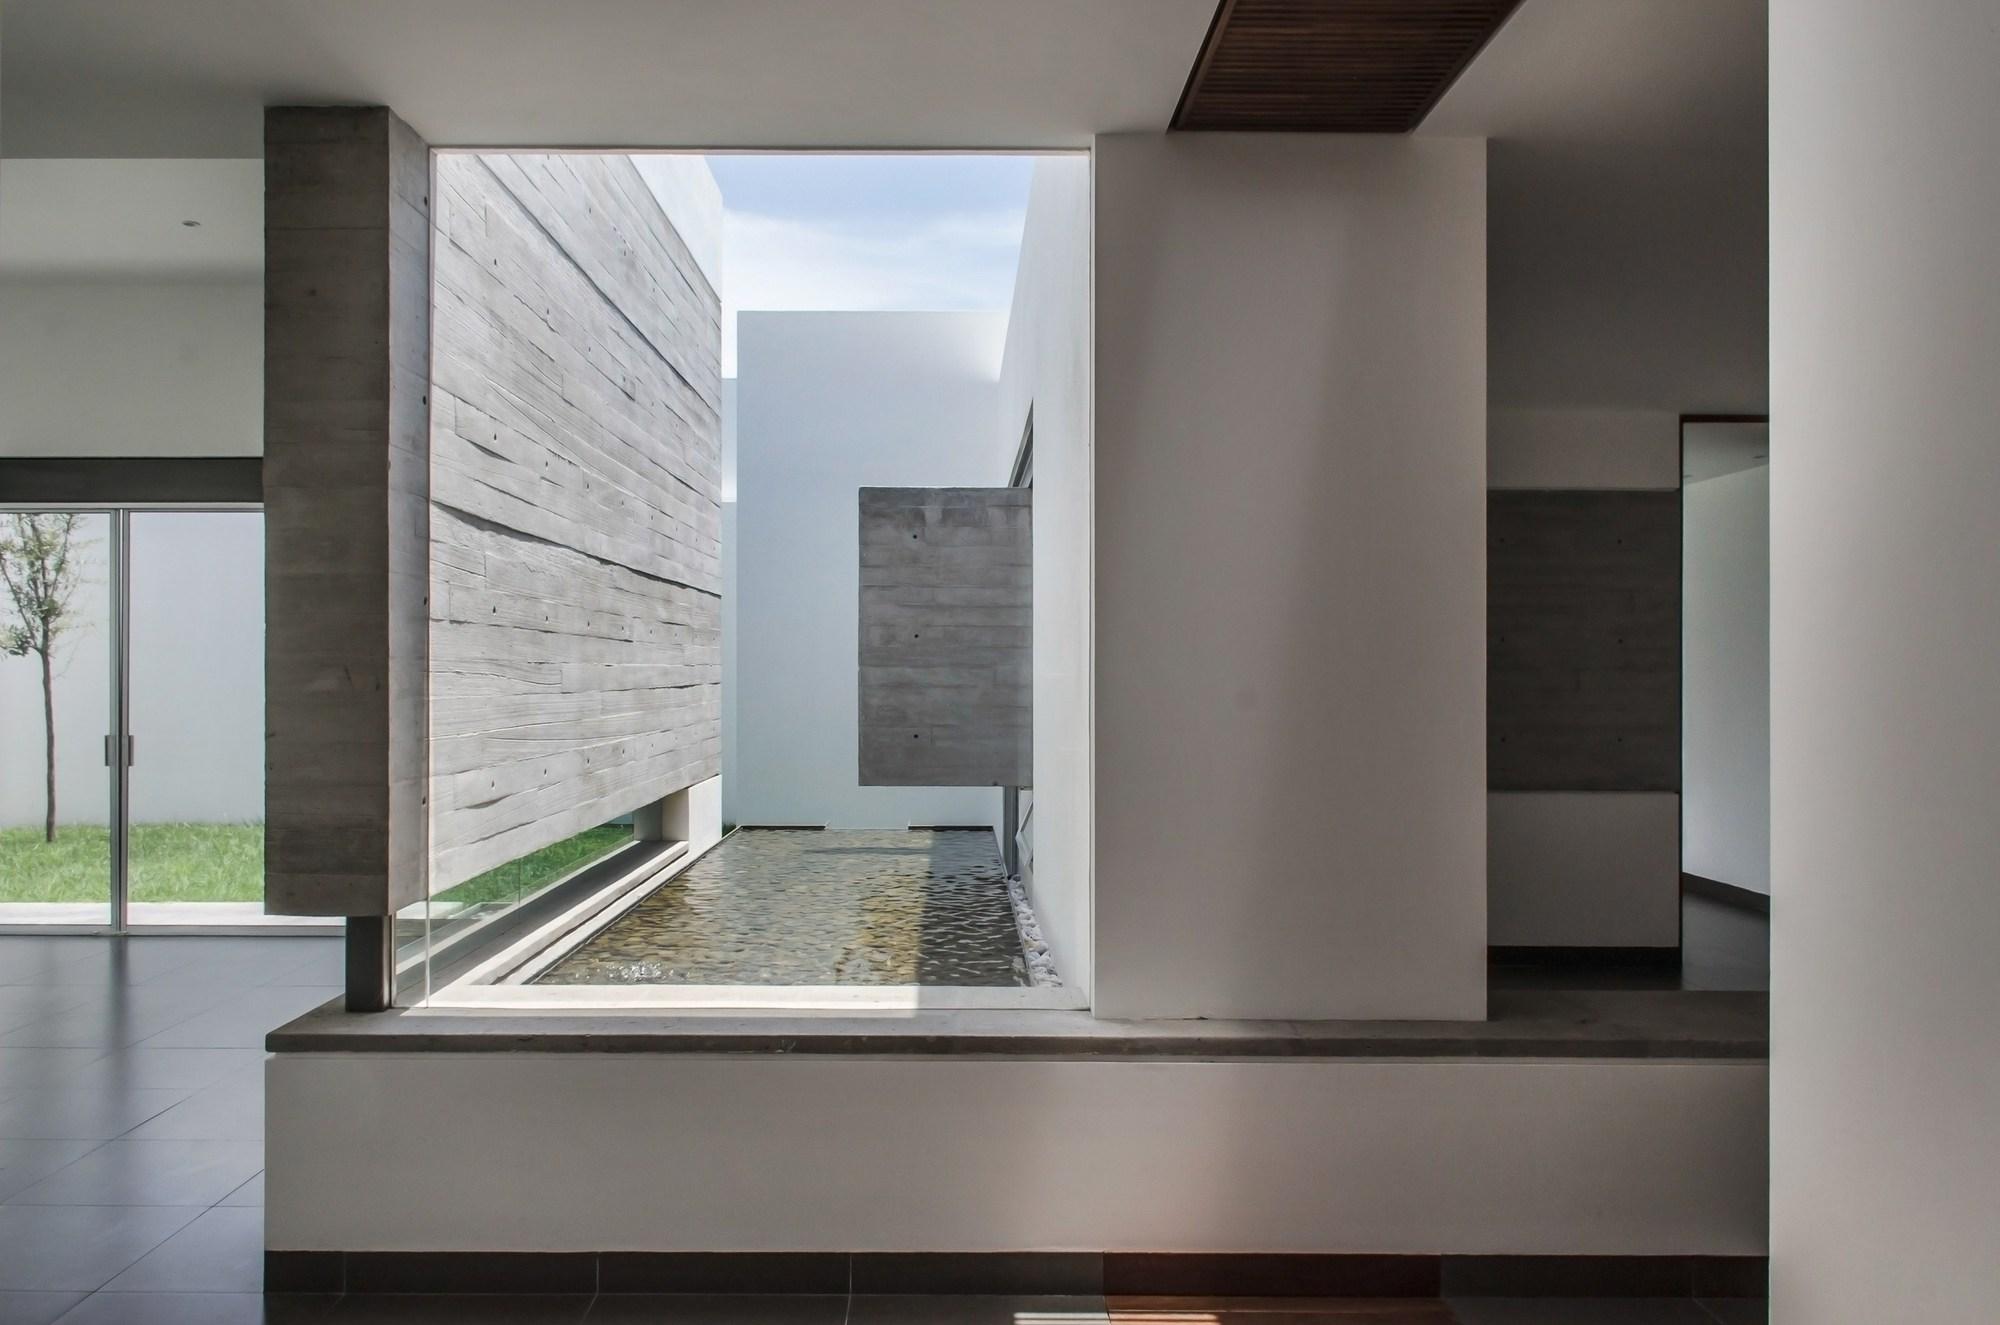 Gallery of t02 adi arquitectura y dise o interior 7 for Arquitectura interior